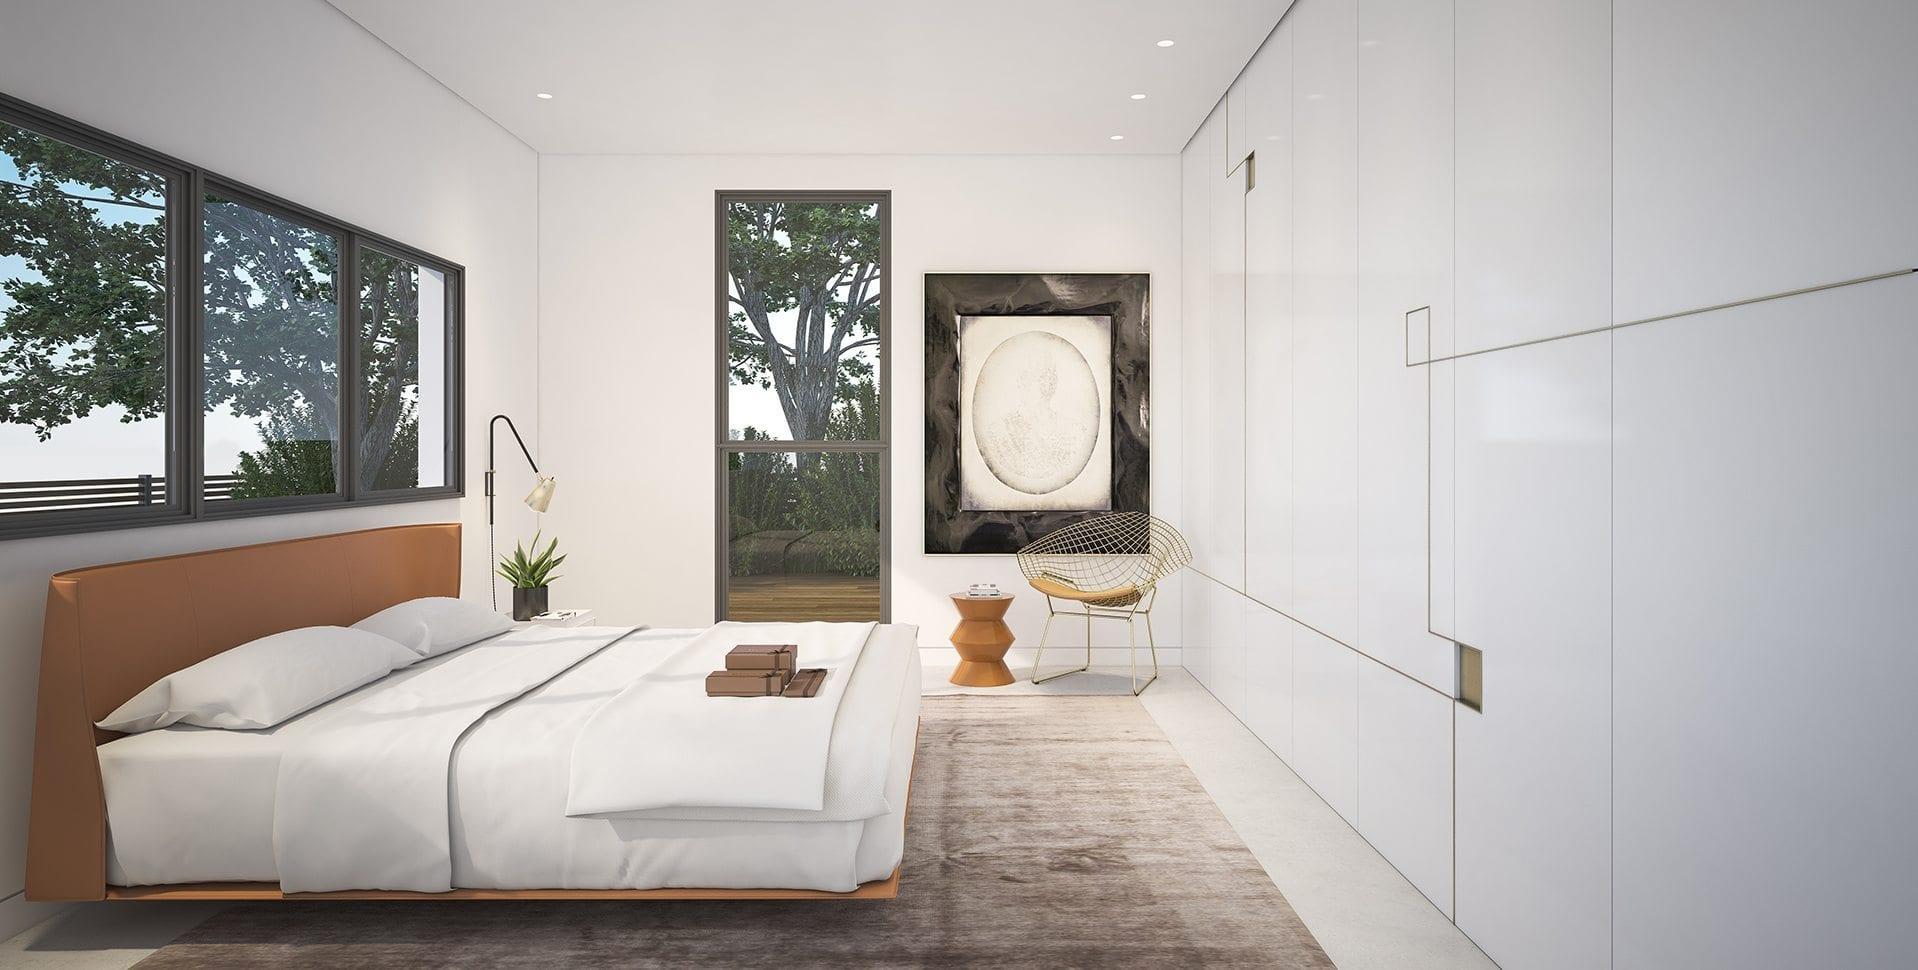 Maayan-Golan_Architectural-Visualization_house-interior-visualization_bedroom_hardof-el-yam_ Rosh-Pina_01